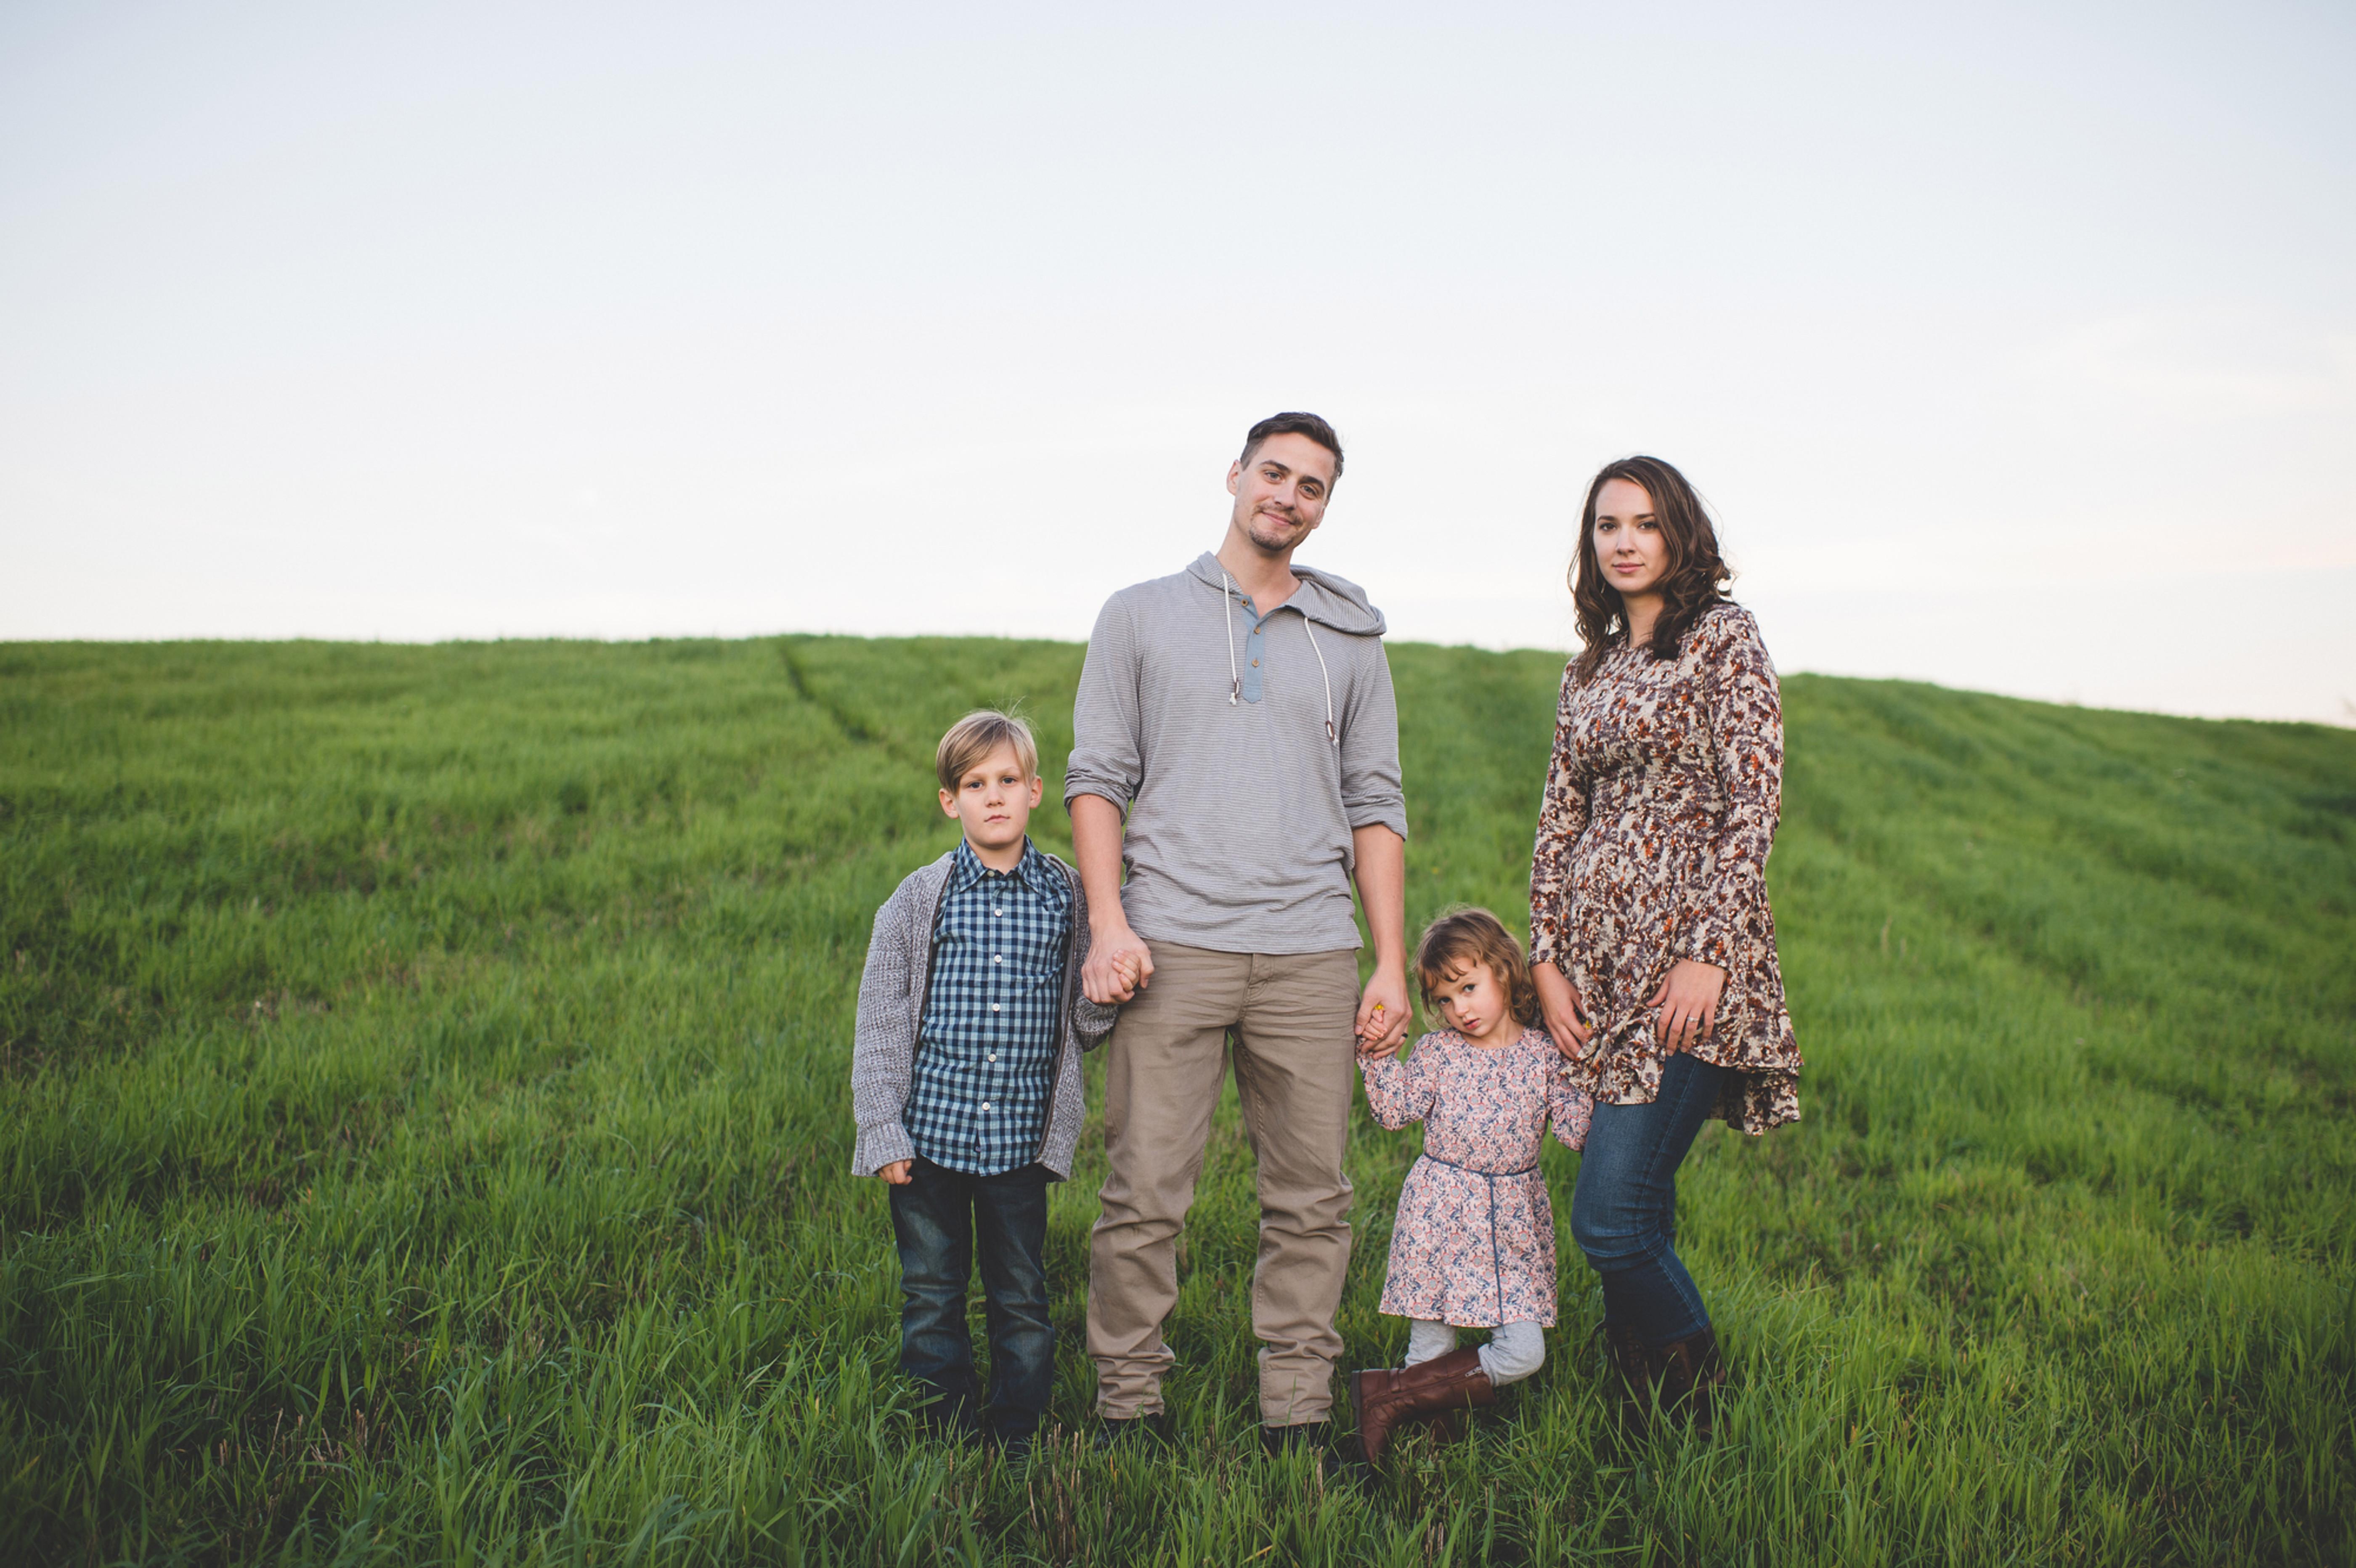 Family Photography Option 2